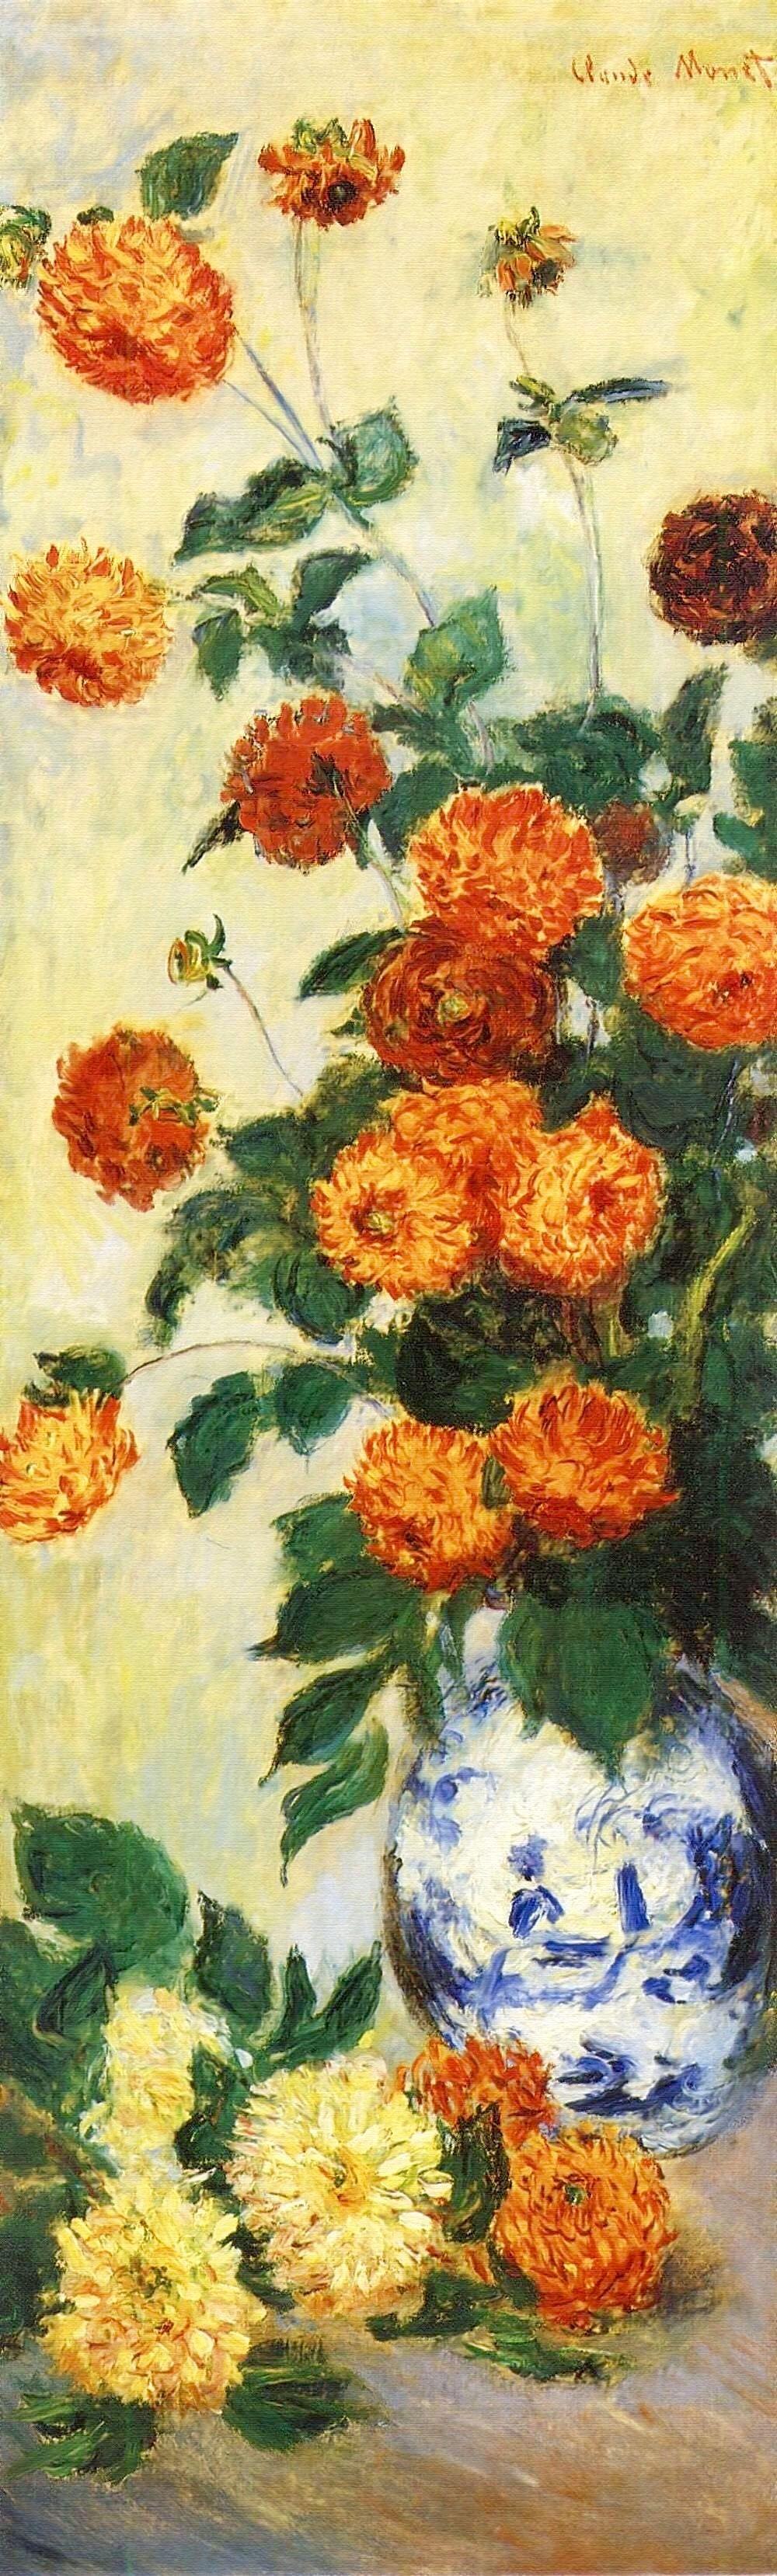 Claude Monet: Dahlias[ダリア] (1883) | Van gogh art, Flower painting, Artist